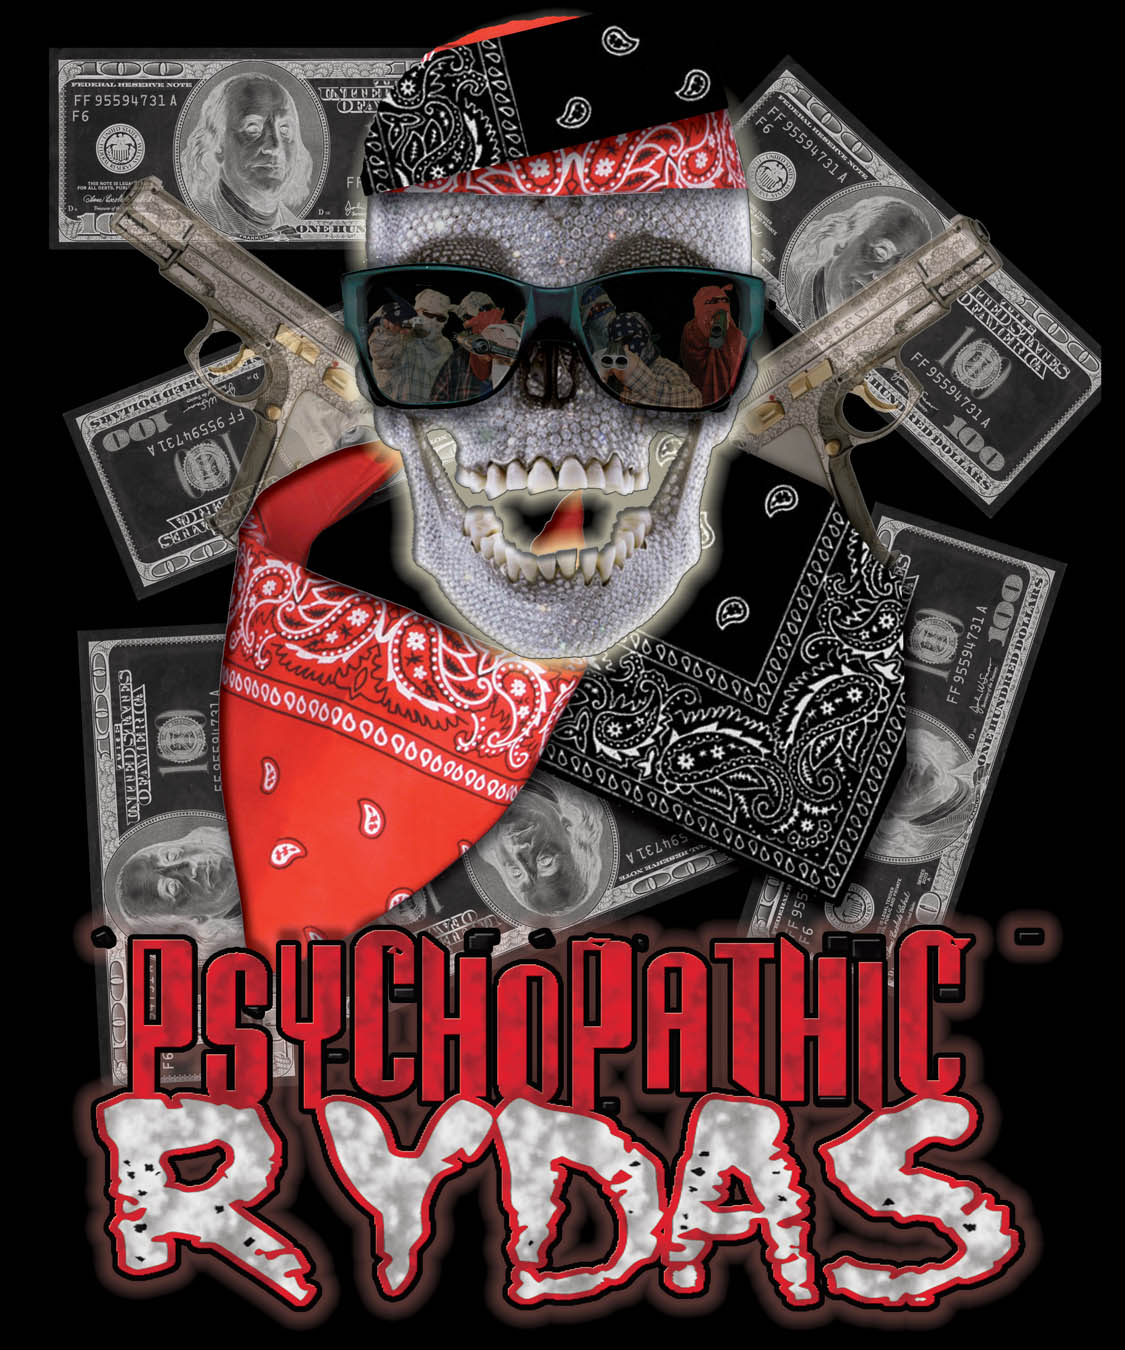 Psychopathic Records Wallpaper Psychopathic rydas 1125x1350